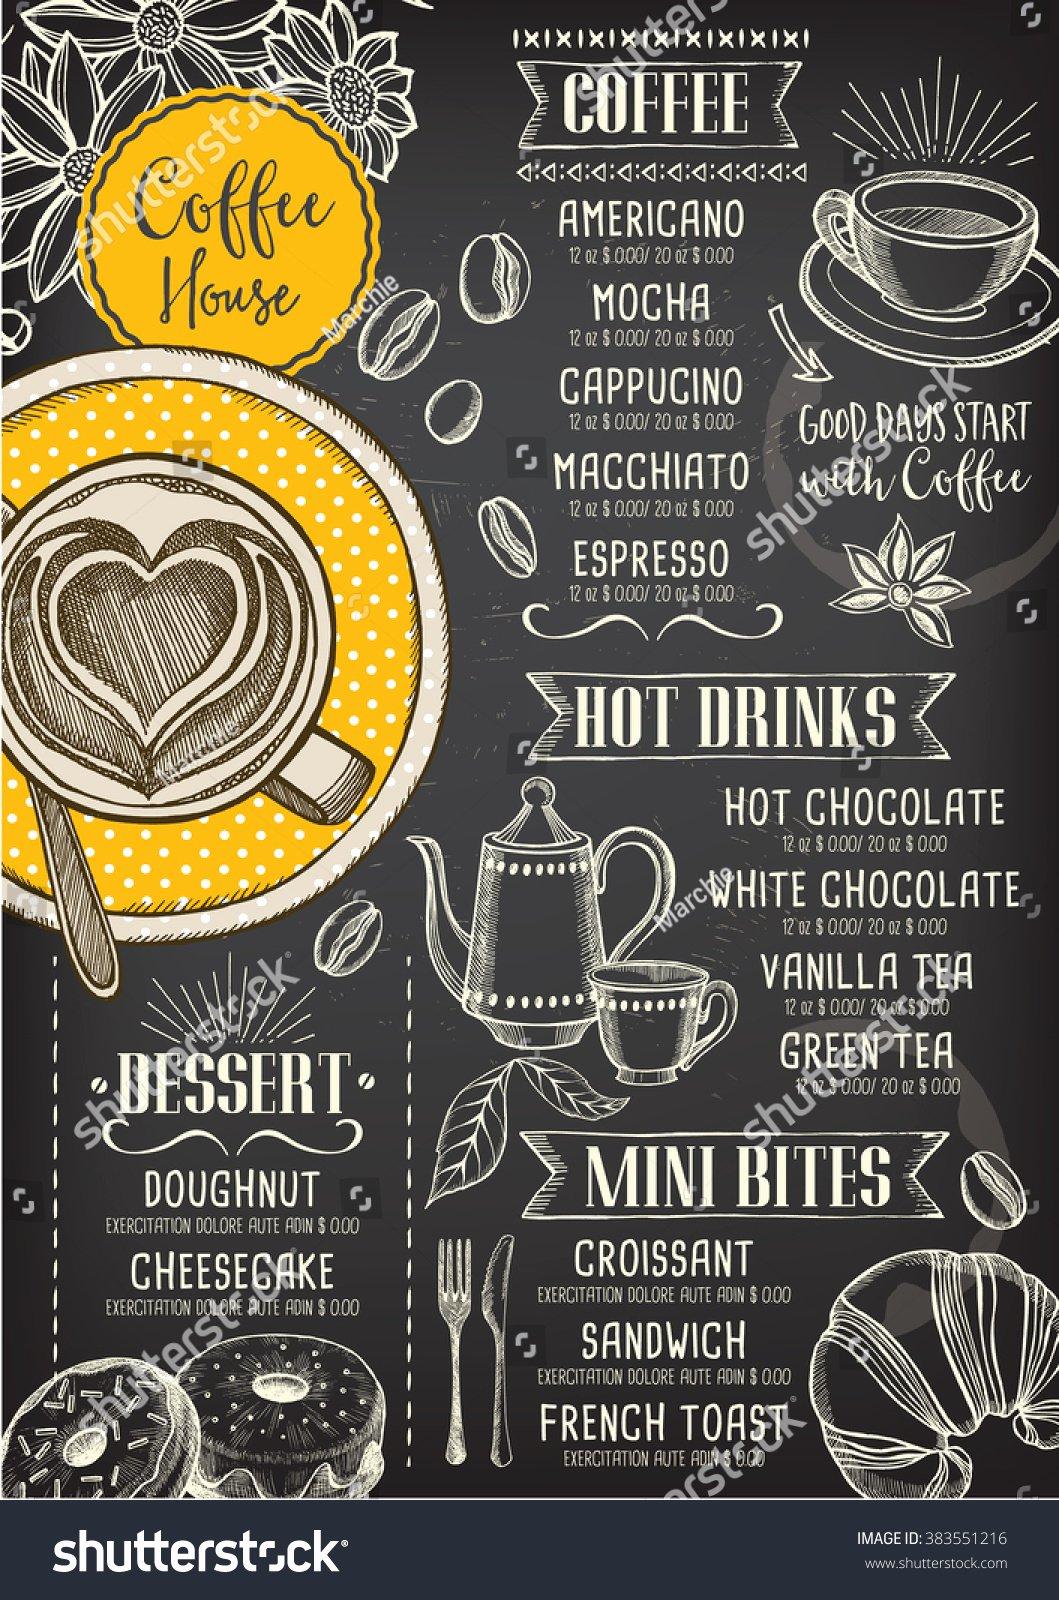 Coffee Shop Menu Template Inspirational Coffee Restaurant Brochure Vector Coffee Shop Menu Design